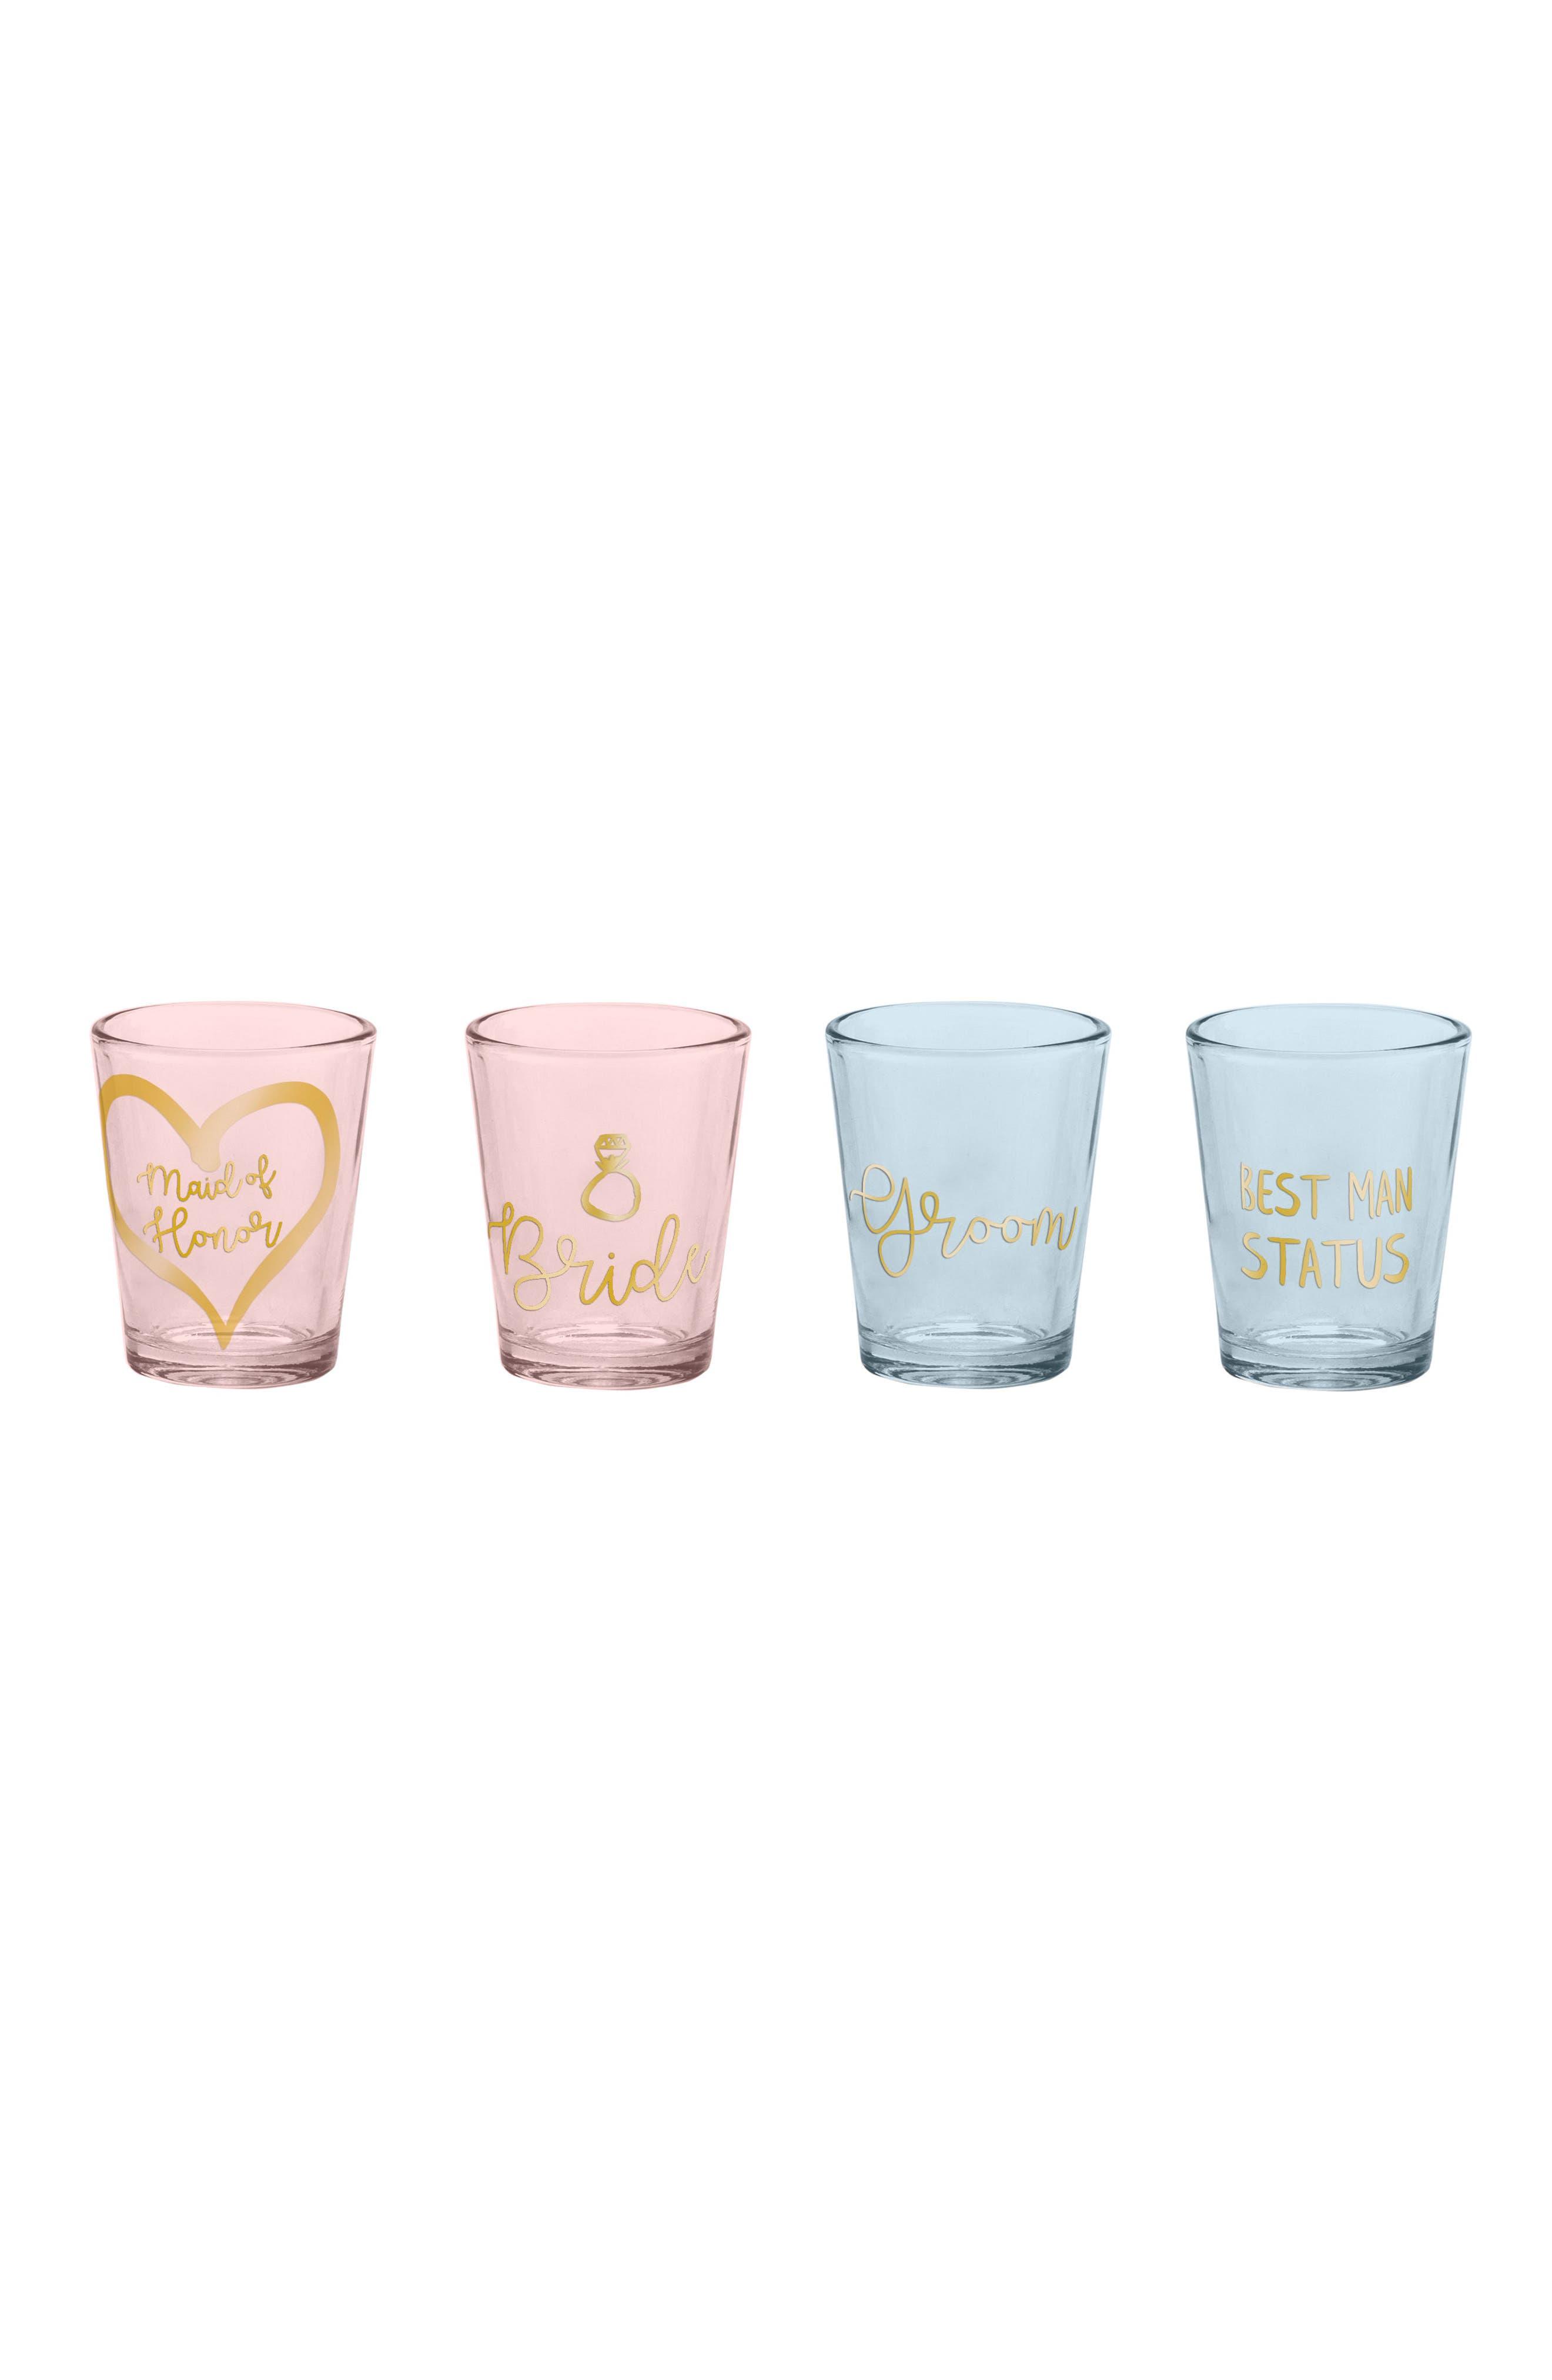 Rosanna Wedding Party Set of 4 Shot Glasses